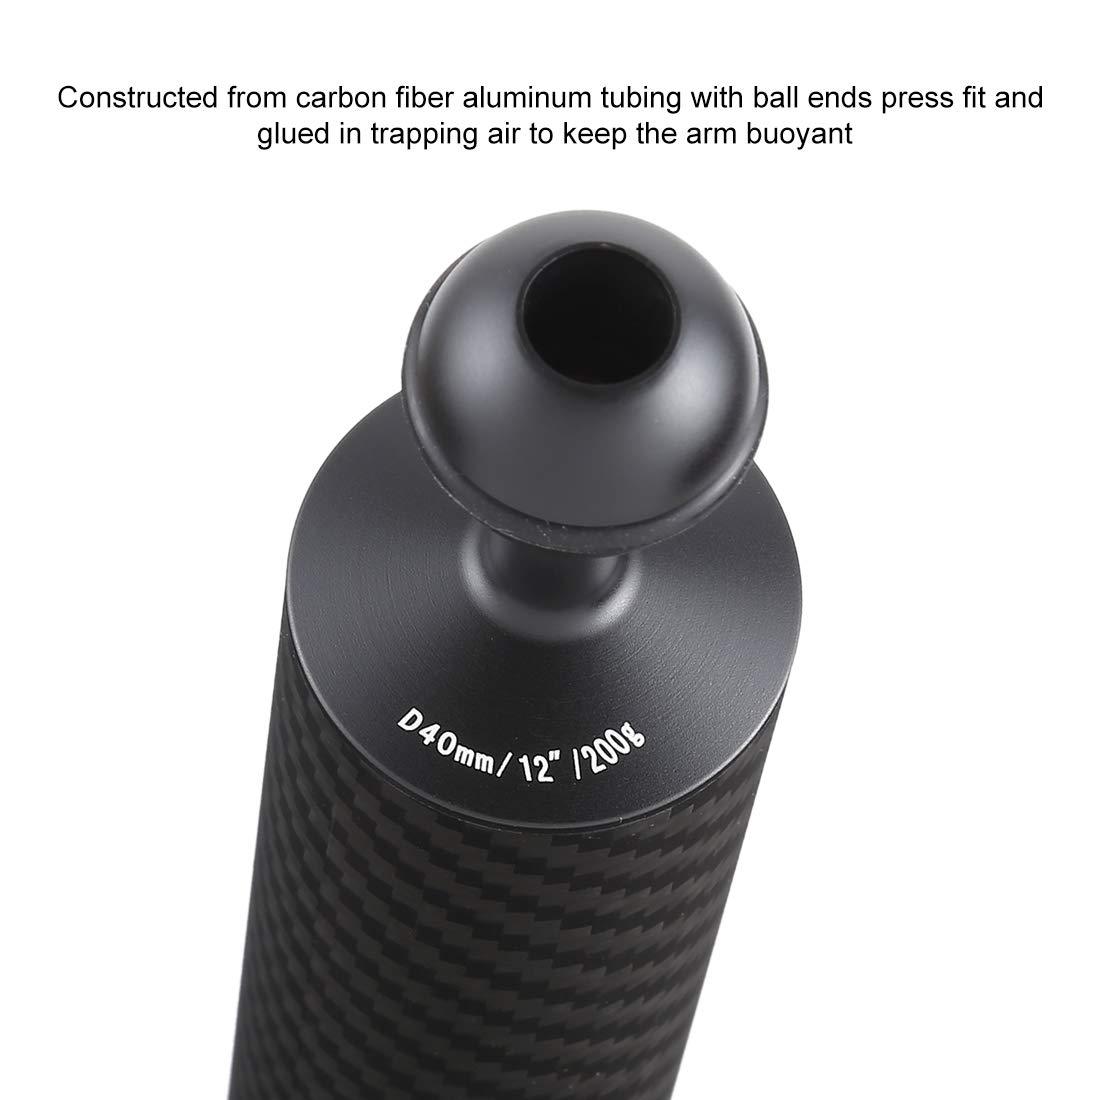 200 g Flotabilidad 25 mm HUANGMENG Buceo 12.59 Pulgadas 32 cm Longitud 40 mm Di/ámetro Bolas Dobles Fibra de Carbono Brazo Flotante Di/ámetro de la Bola